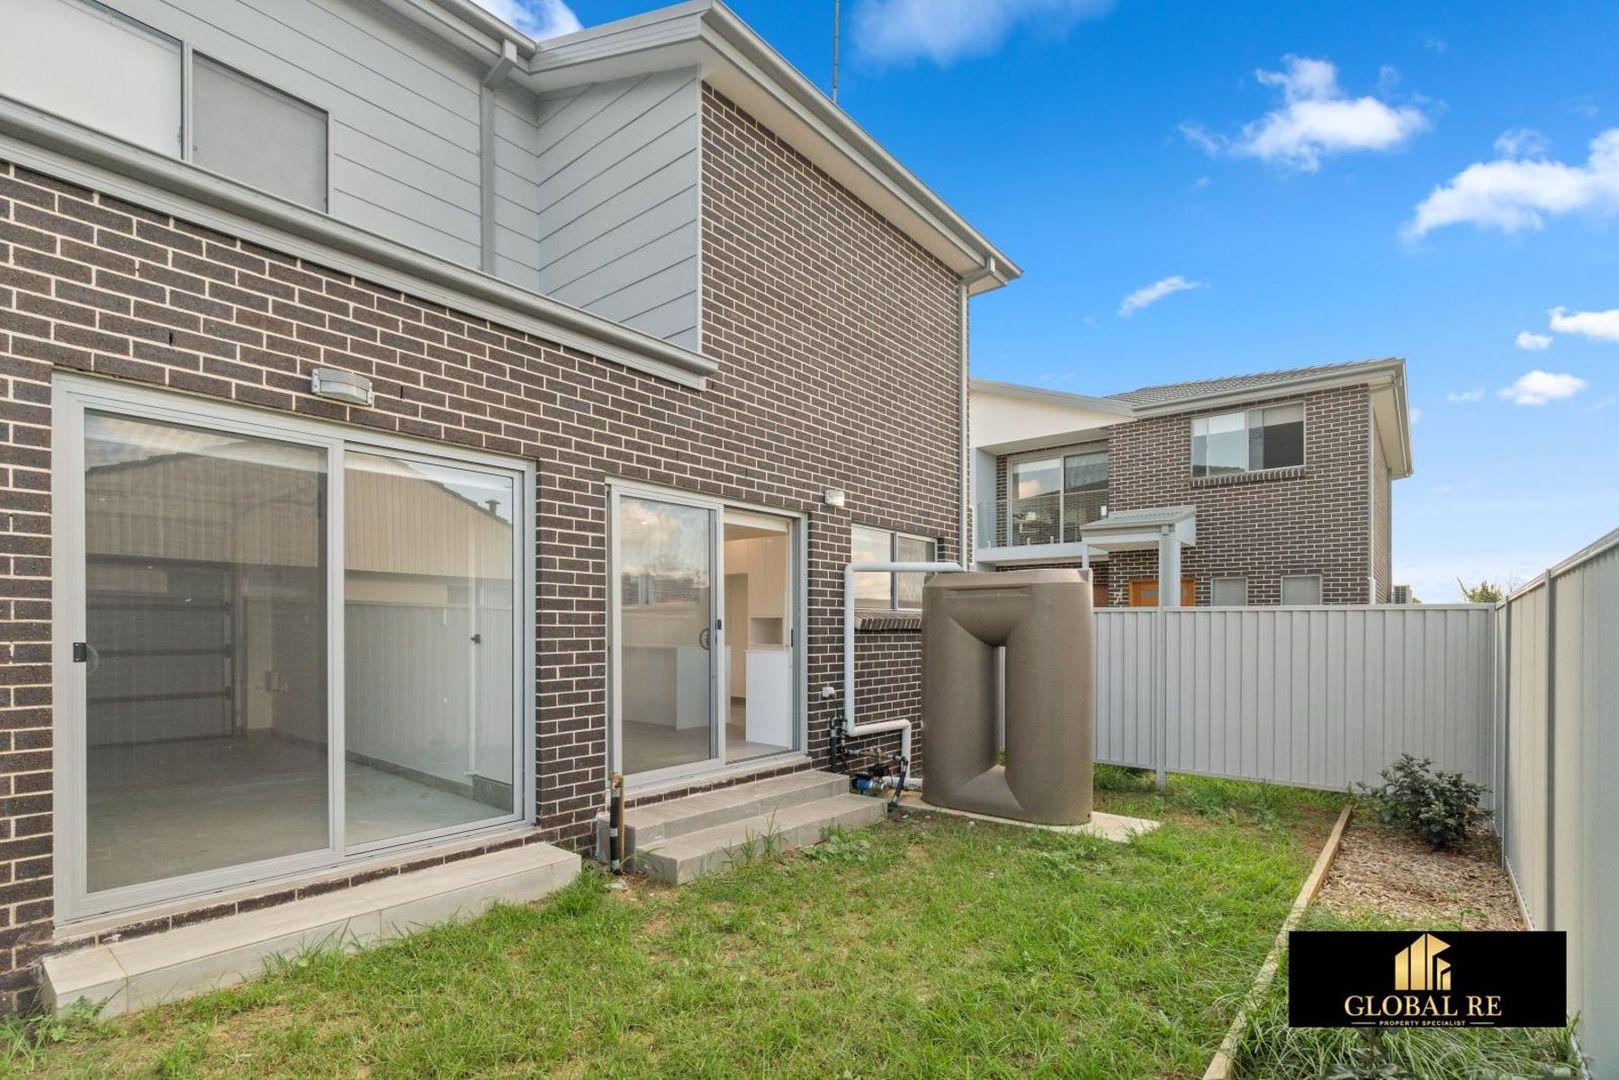 2/13-15 Gibson avenue, Casula NSW 2170, Image 2